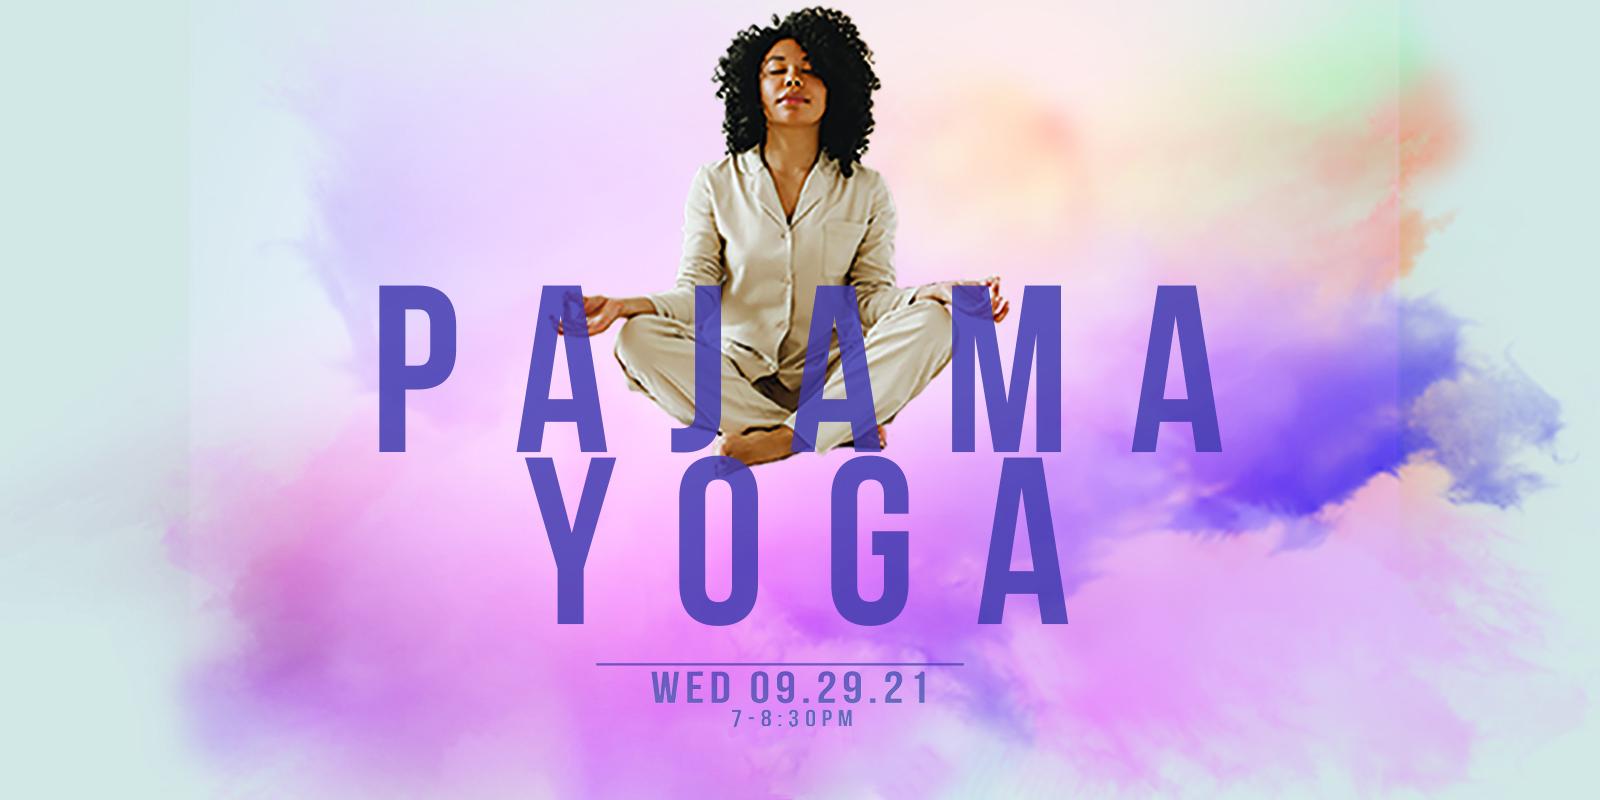 Pajama Yoga: Yin + Nidra + Sound